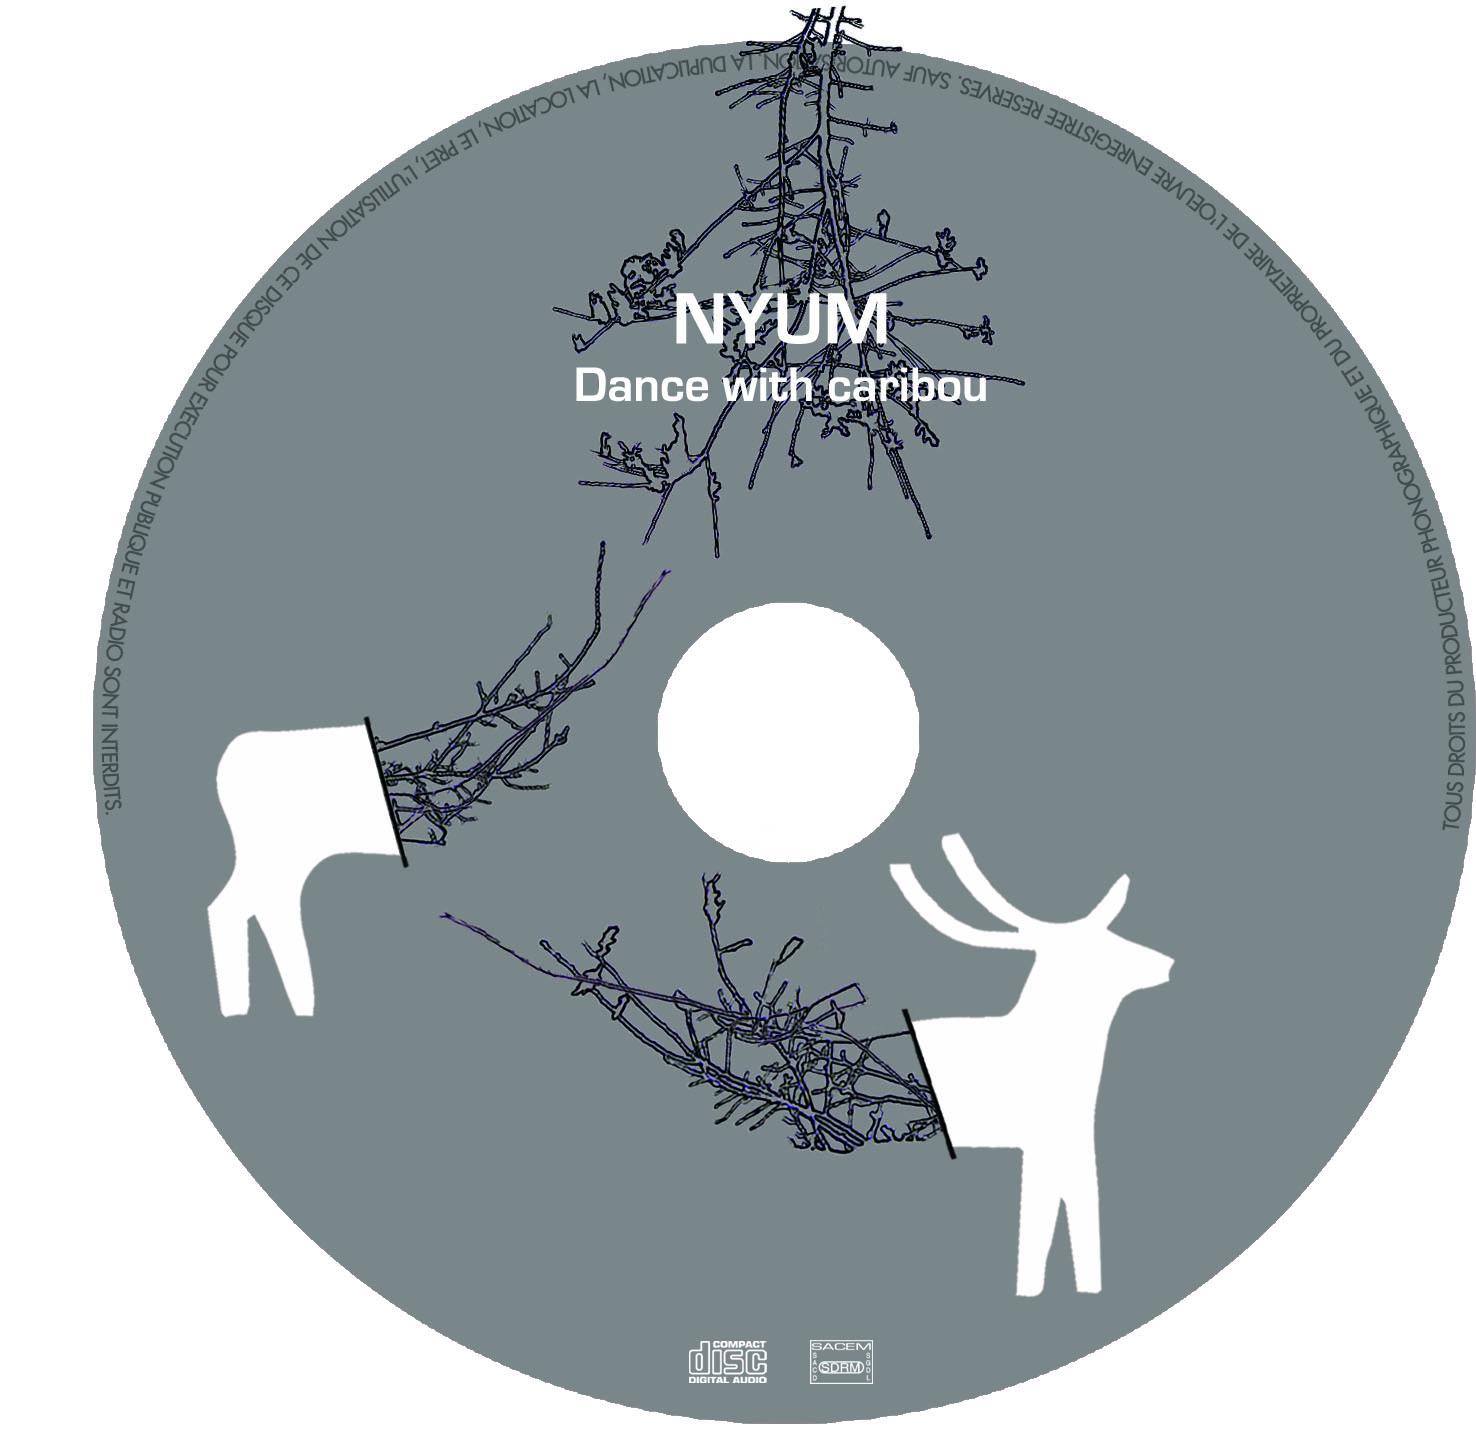 Nyum_Dance with caribou_CompactDisc